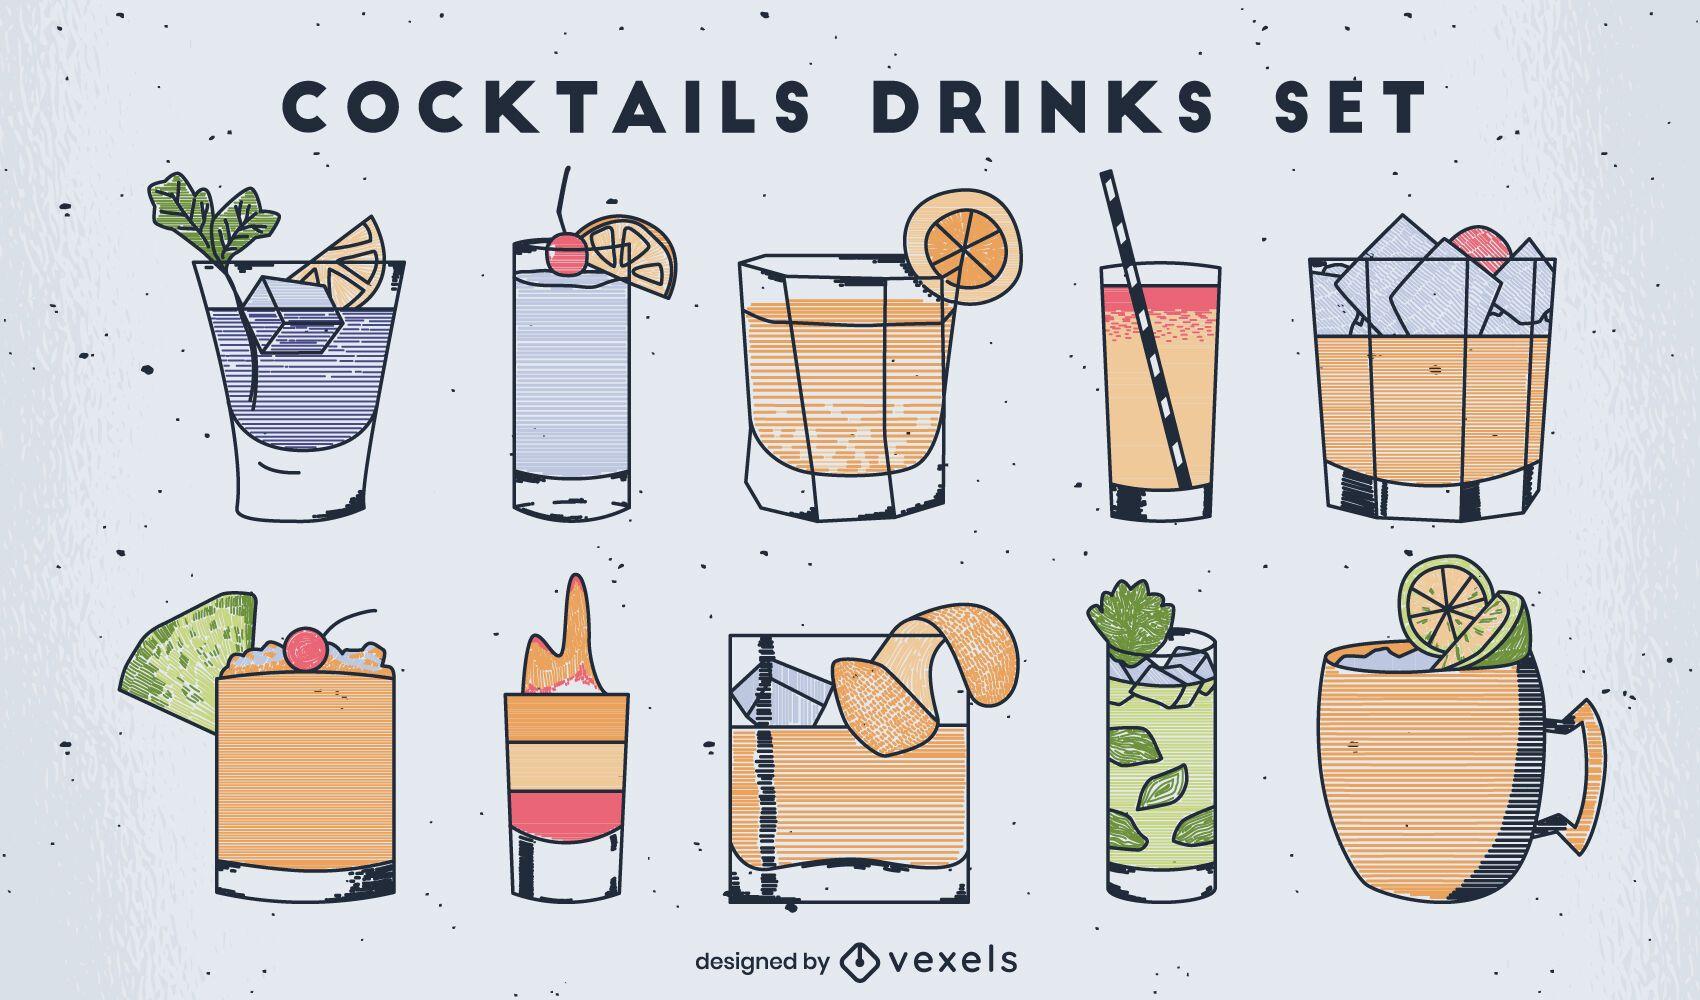 Cocktail drinks colorful line art set